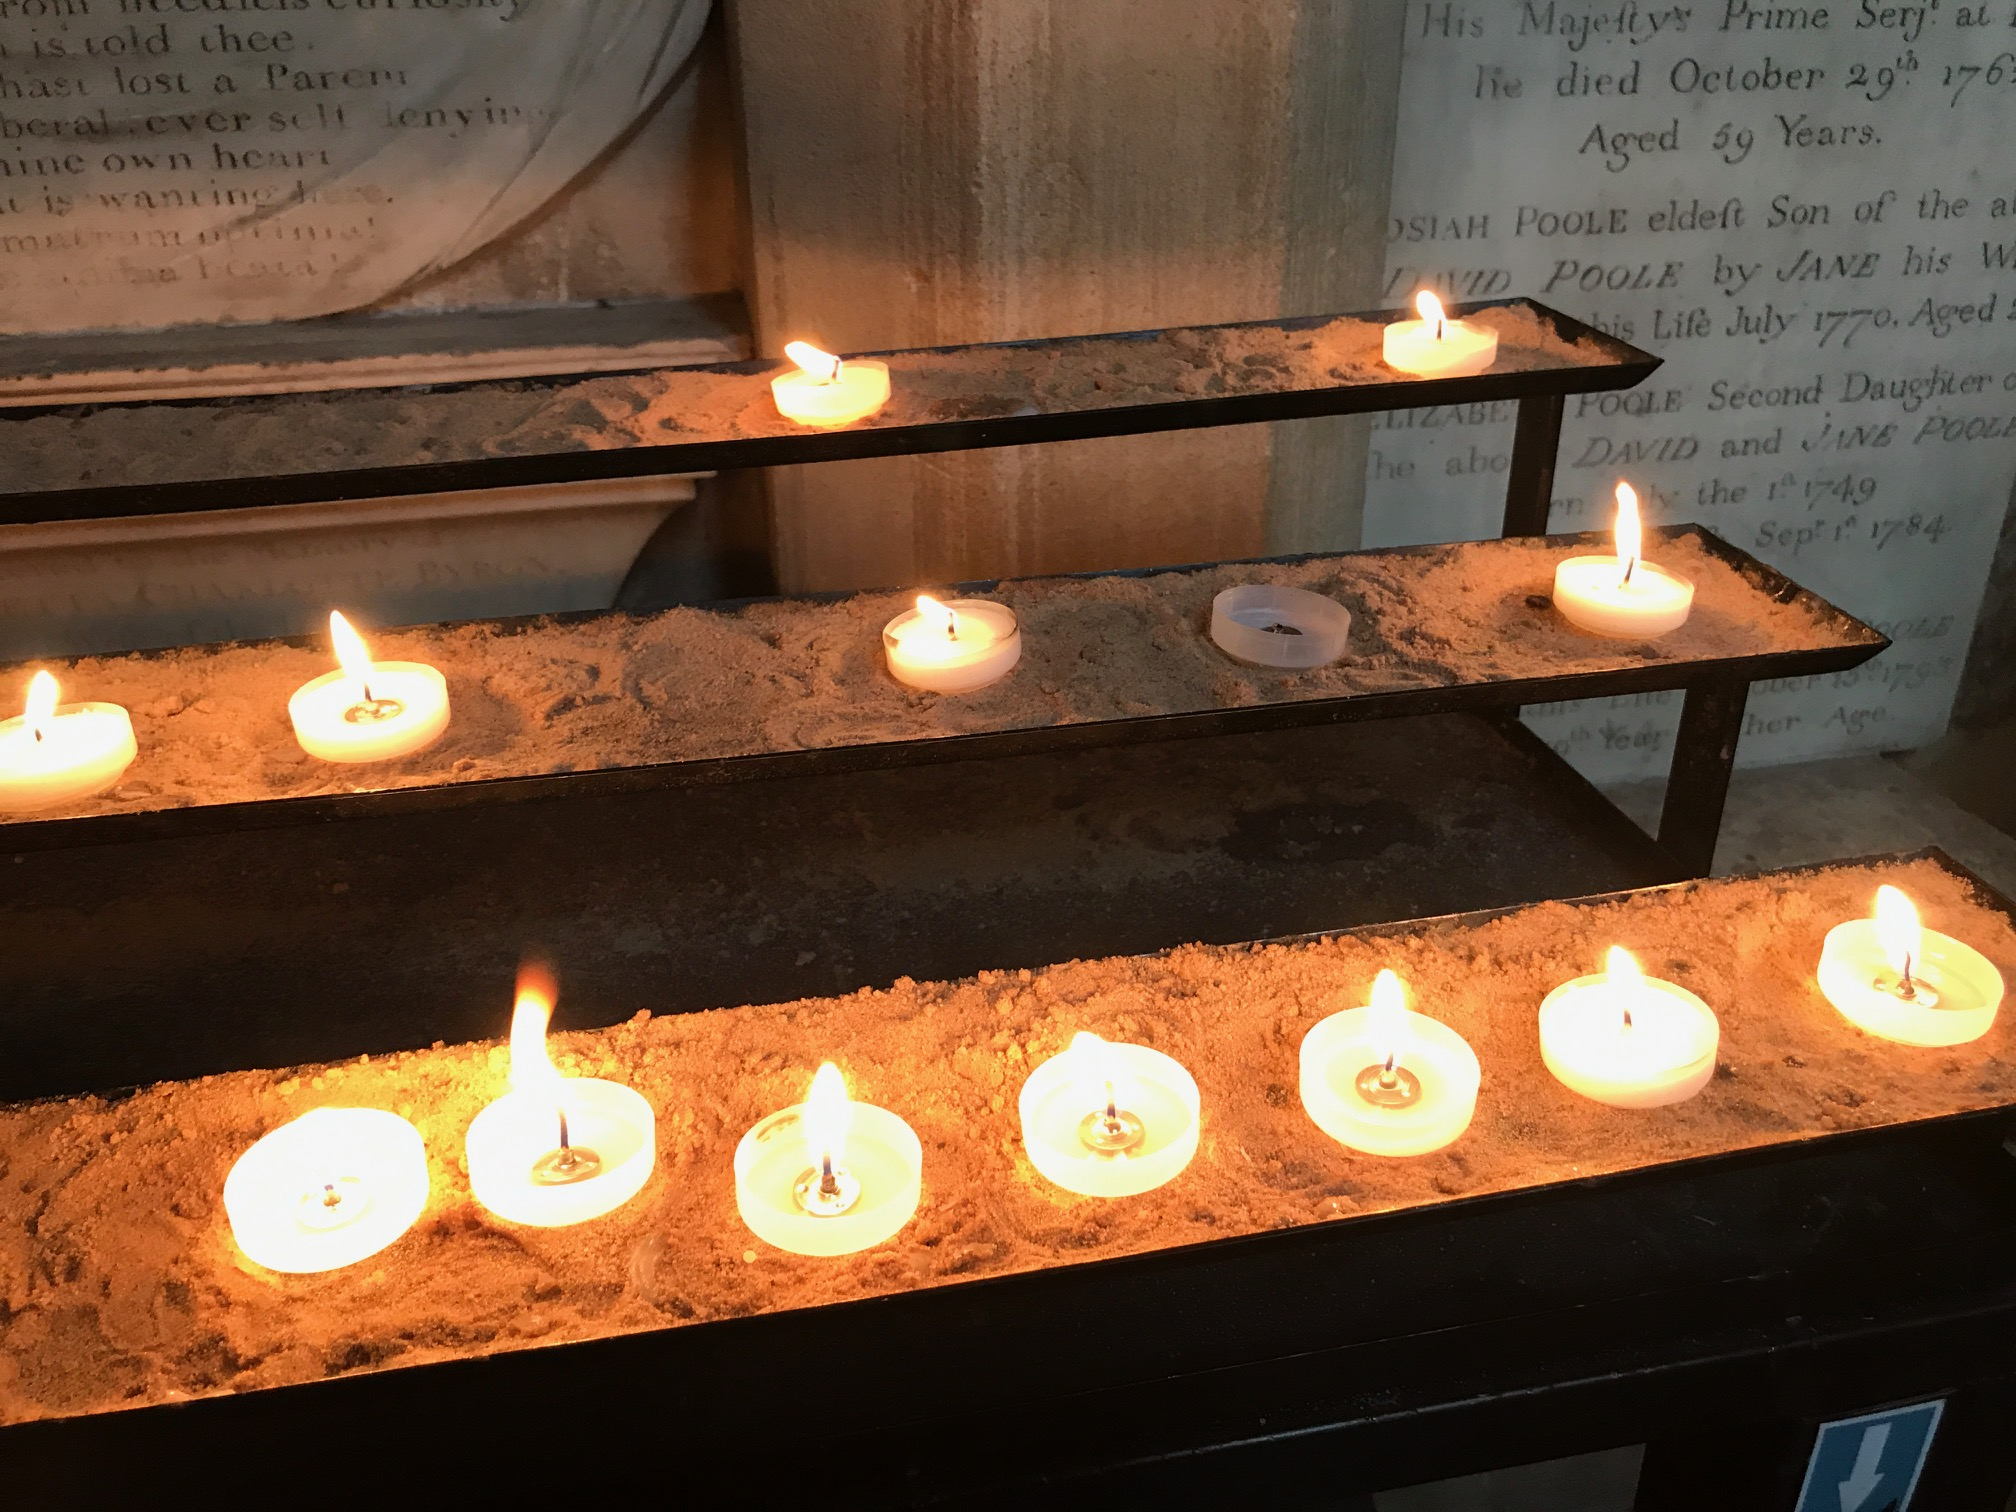 Prayers of light, Bath Abbey